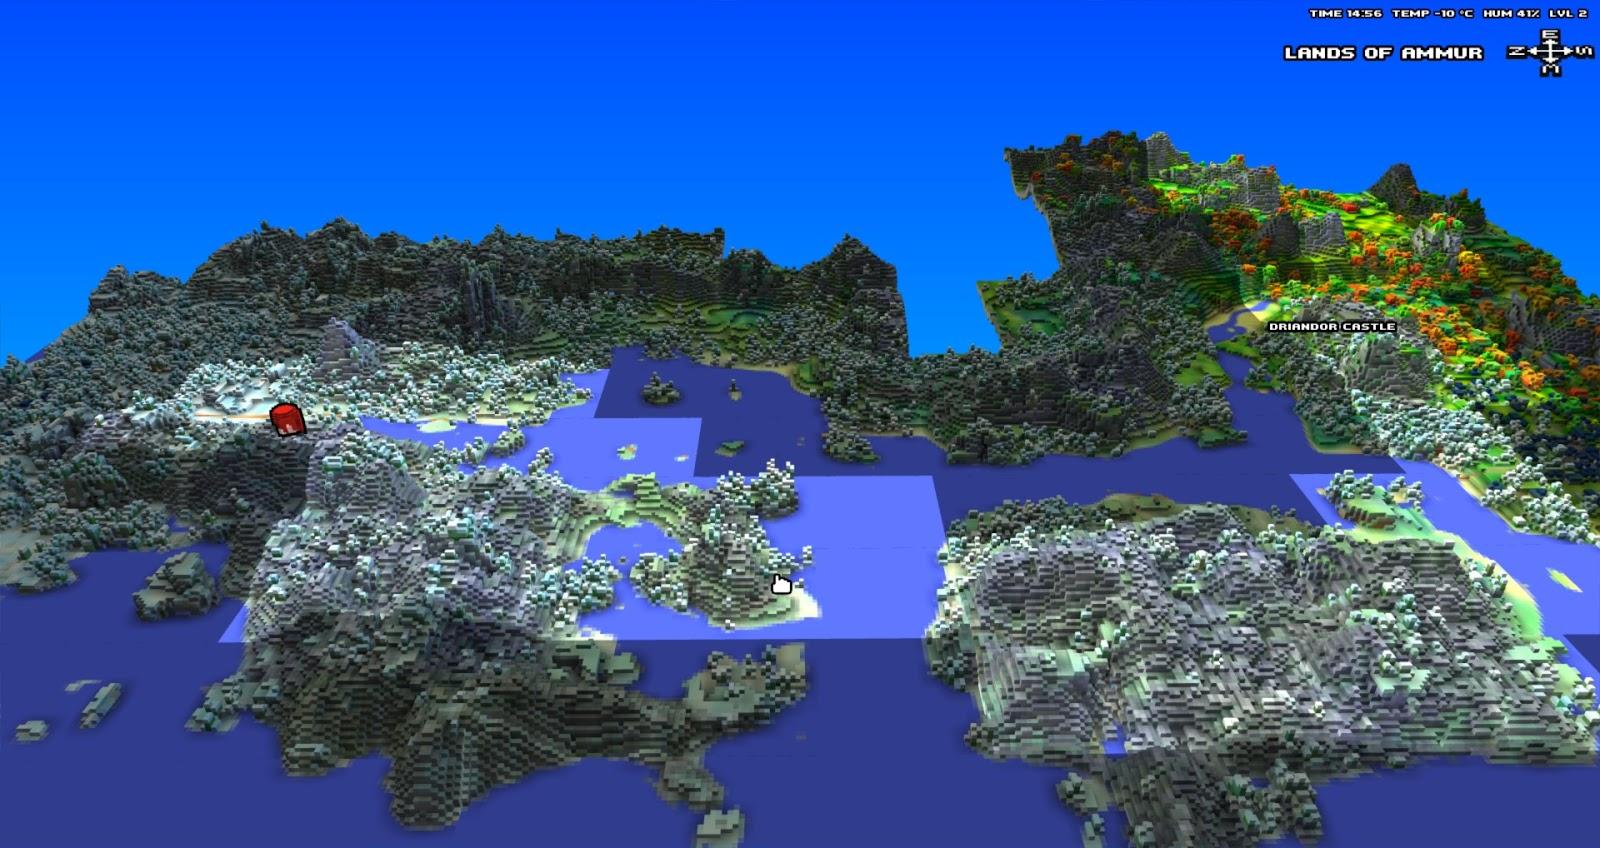 Wollays blog cube world landscape screenshots gumiabroncs Choice Image